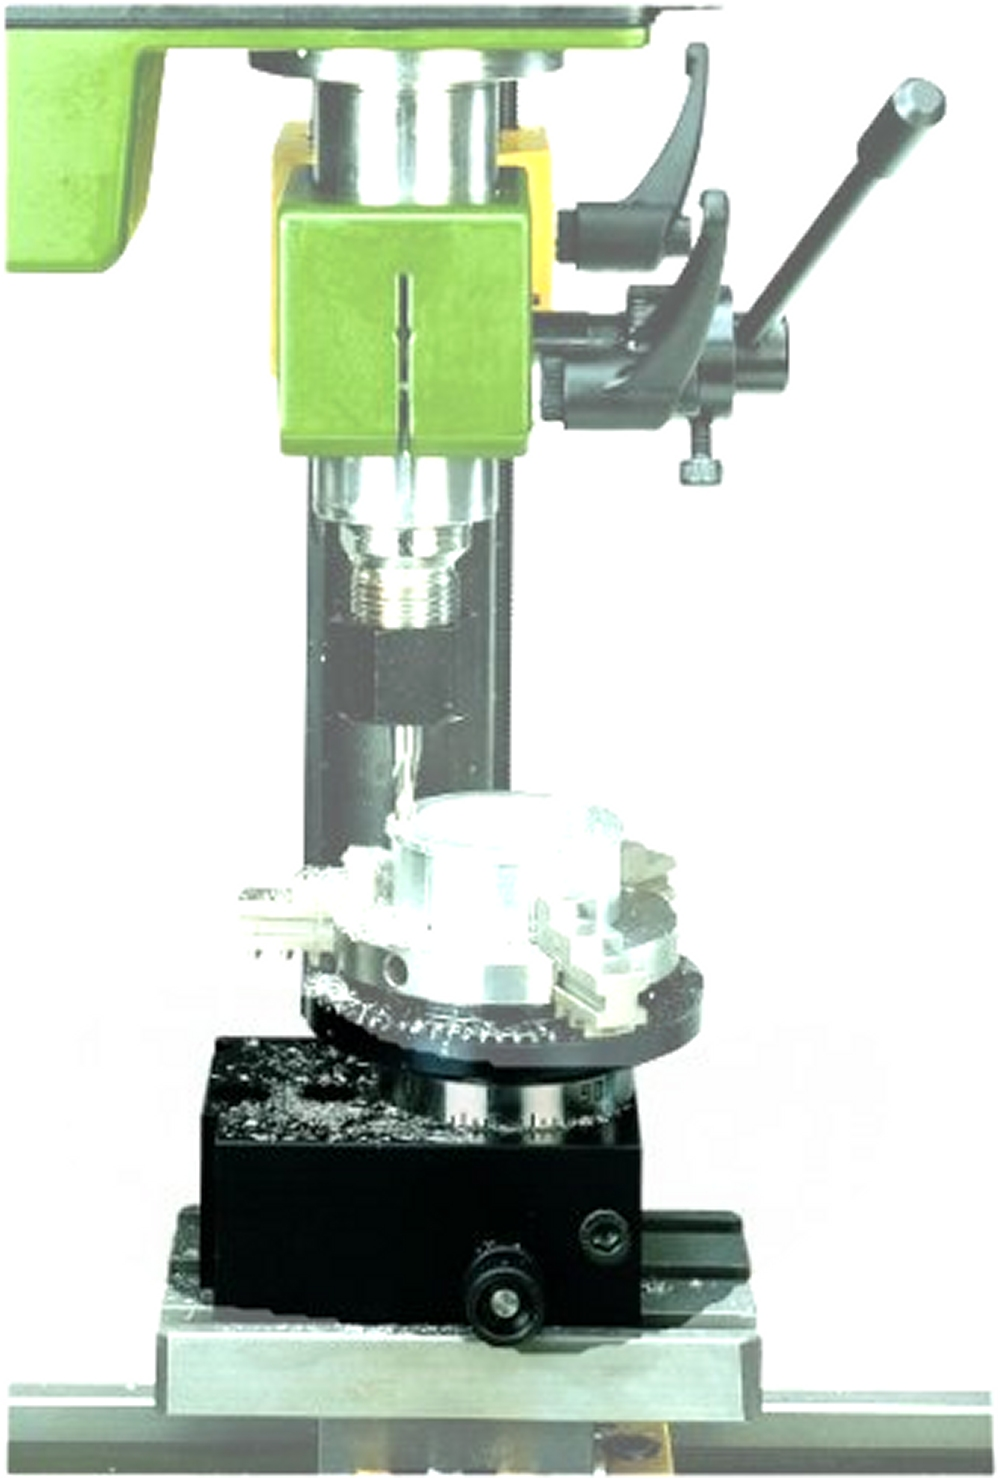 PROXXON 24131 Teilapparat TA 230 für Drehmaschine PD230/E Feinfräse PF230 und FF230